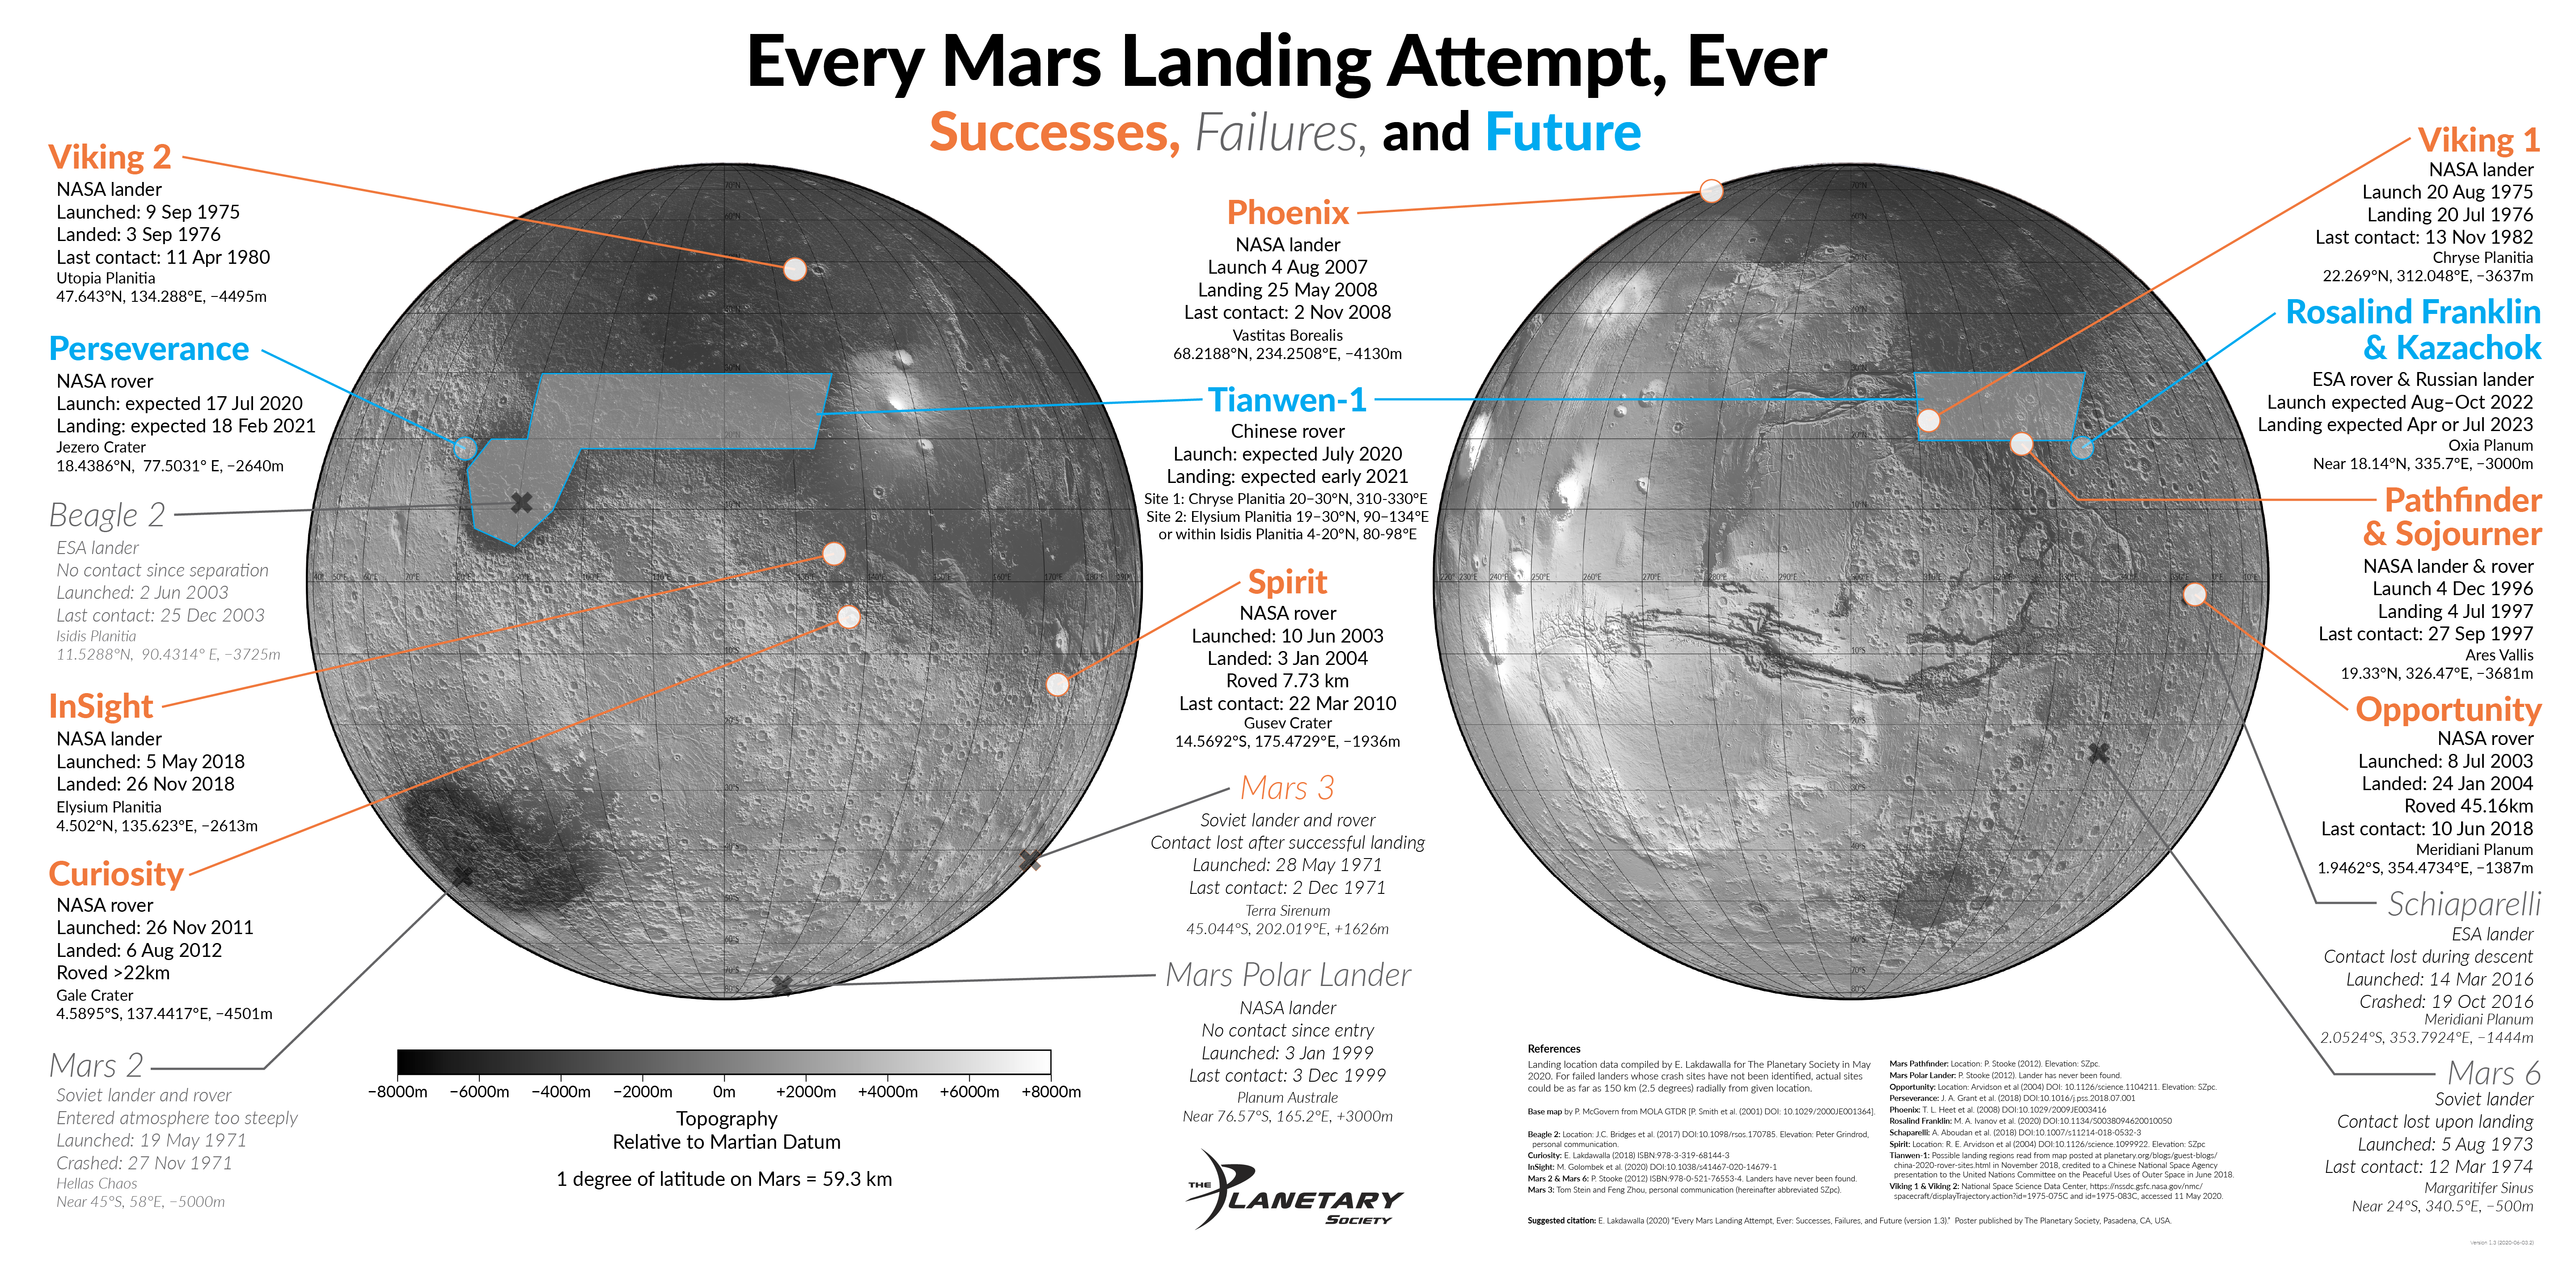 20200603_map-mars-landing-sites-2020-detailed_ver1-3.png